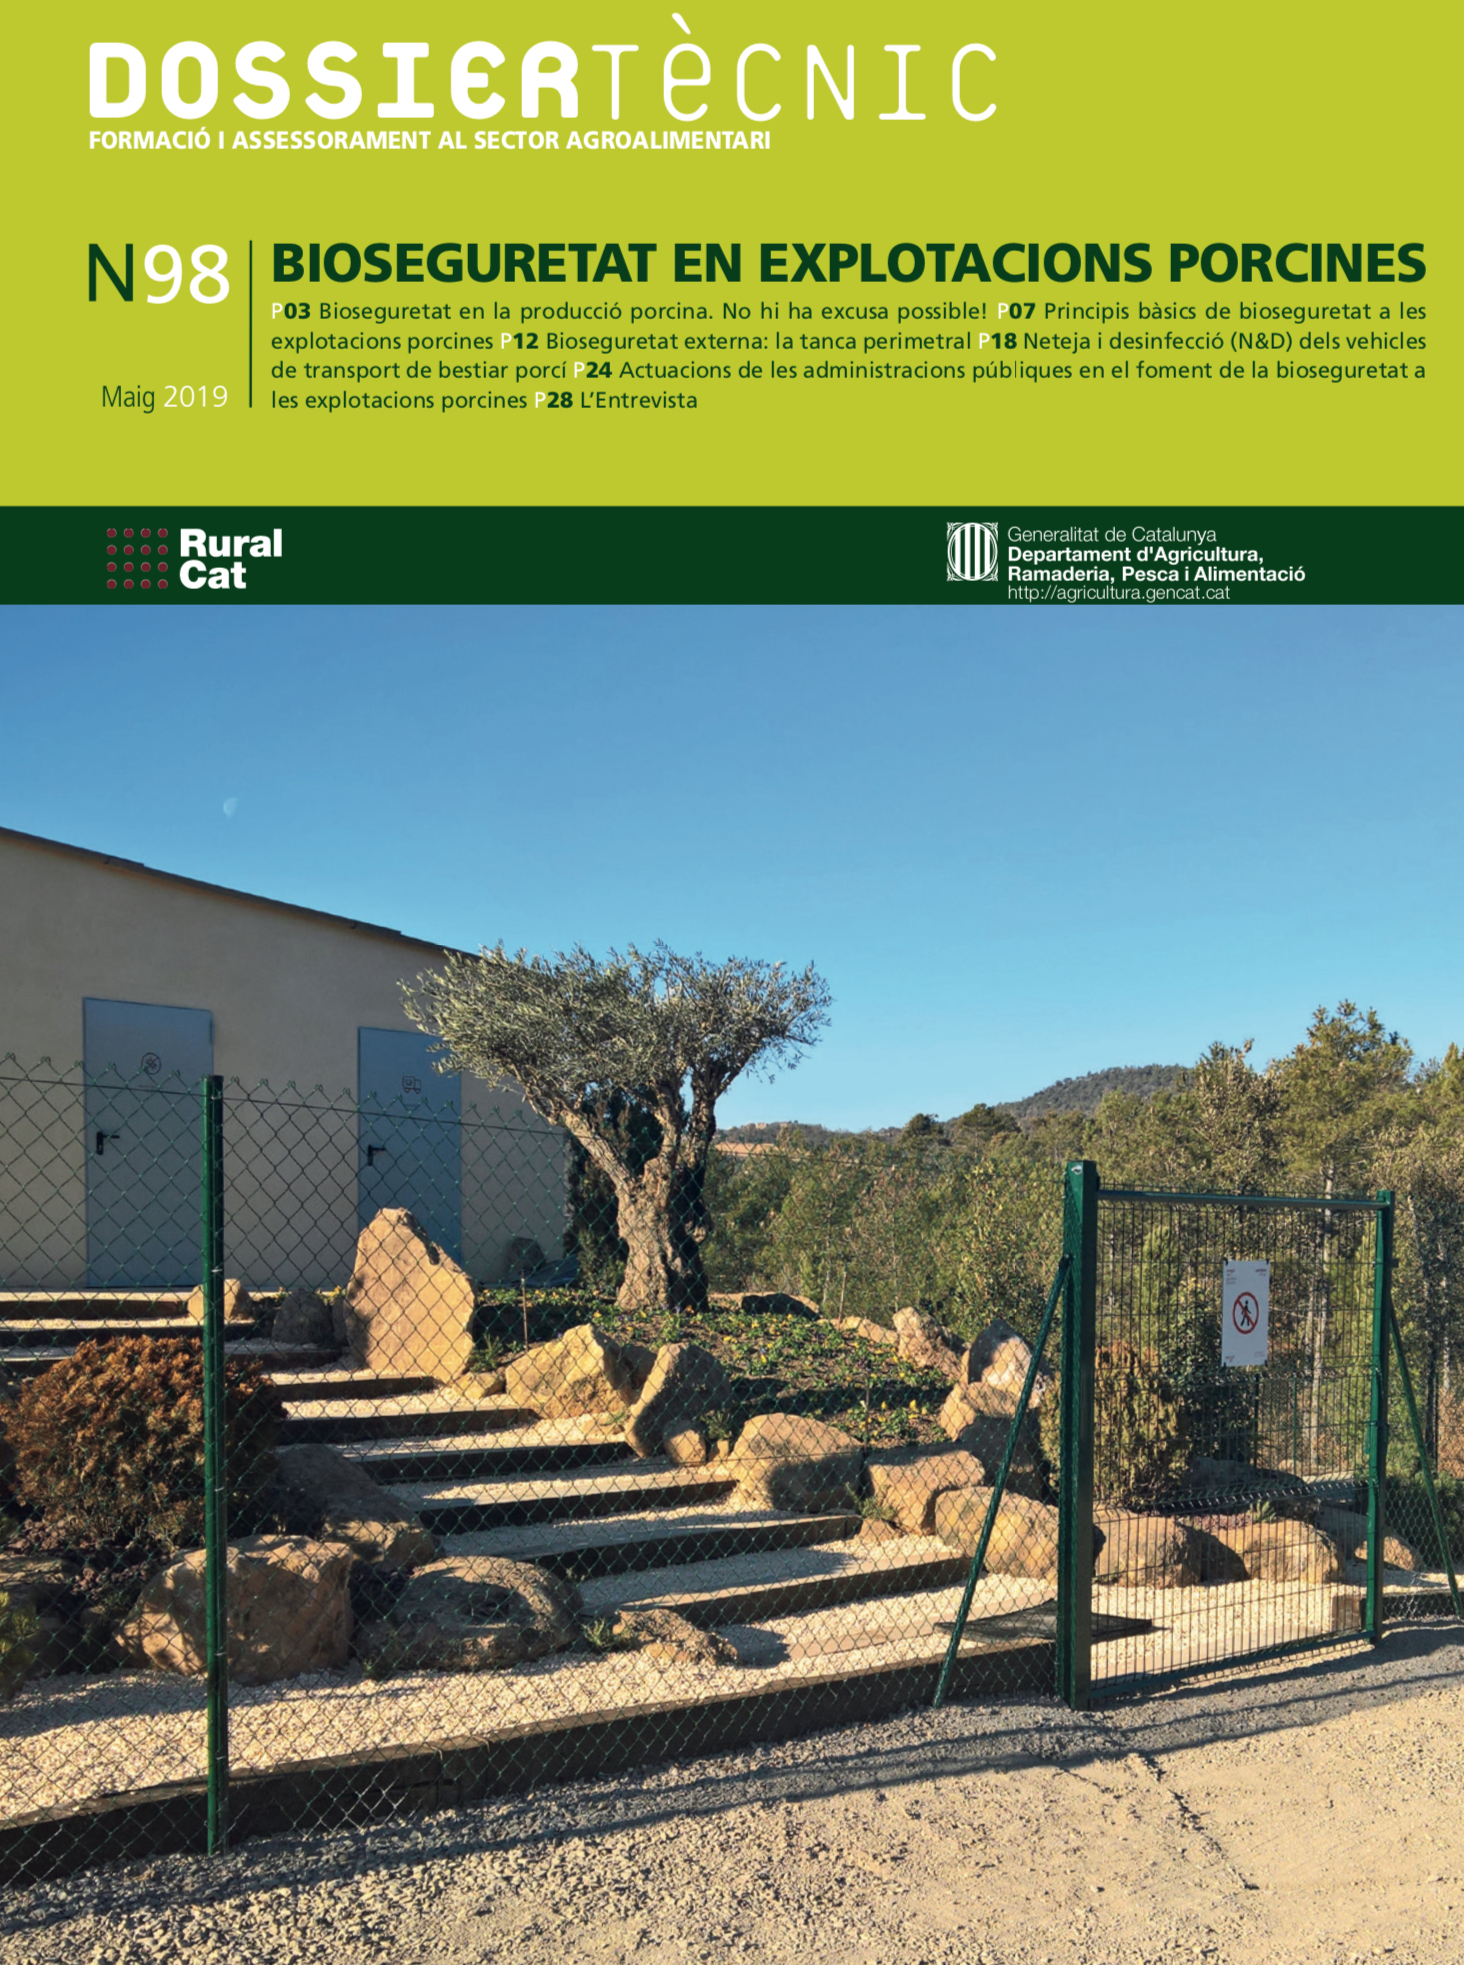 Sergal - Bioseguretat - Ruralcat